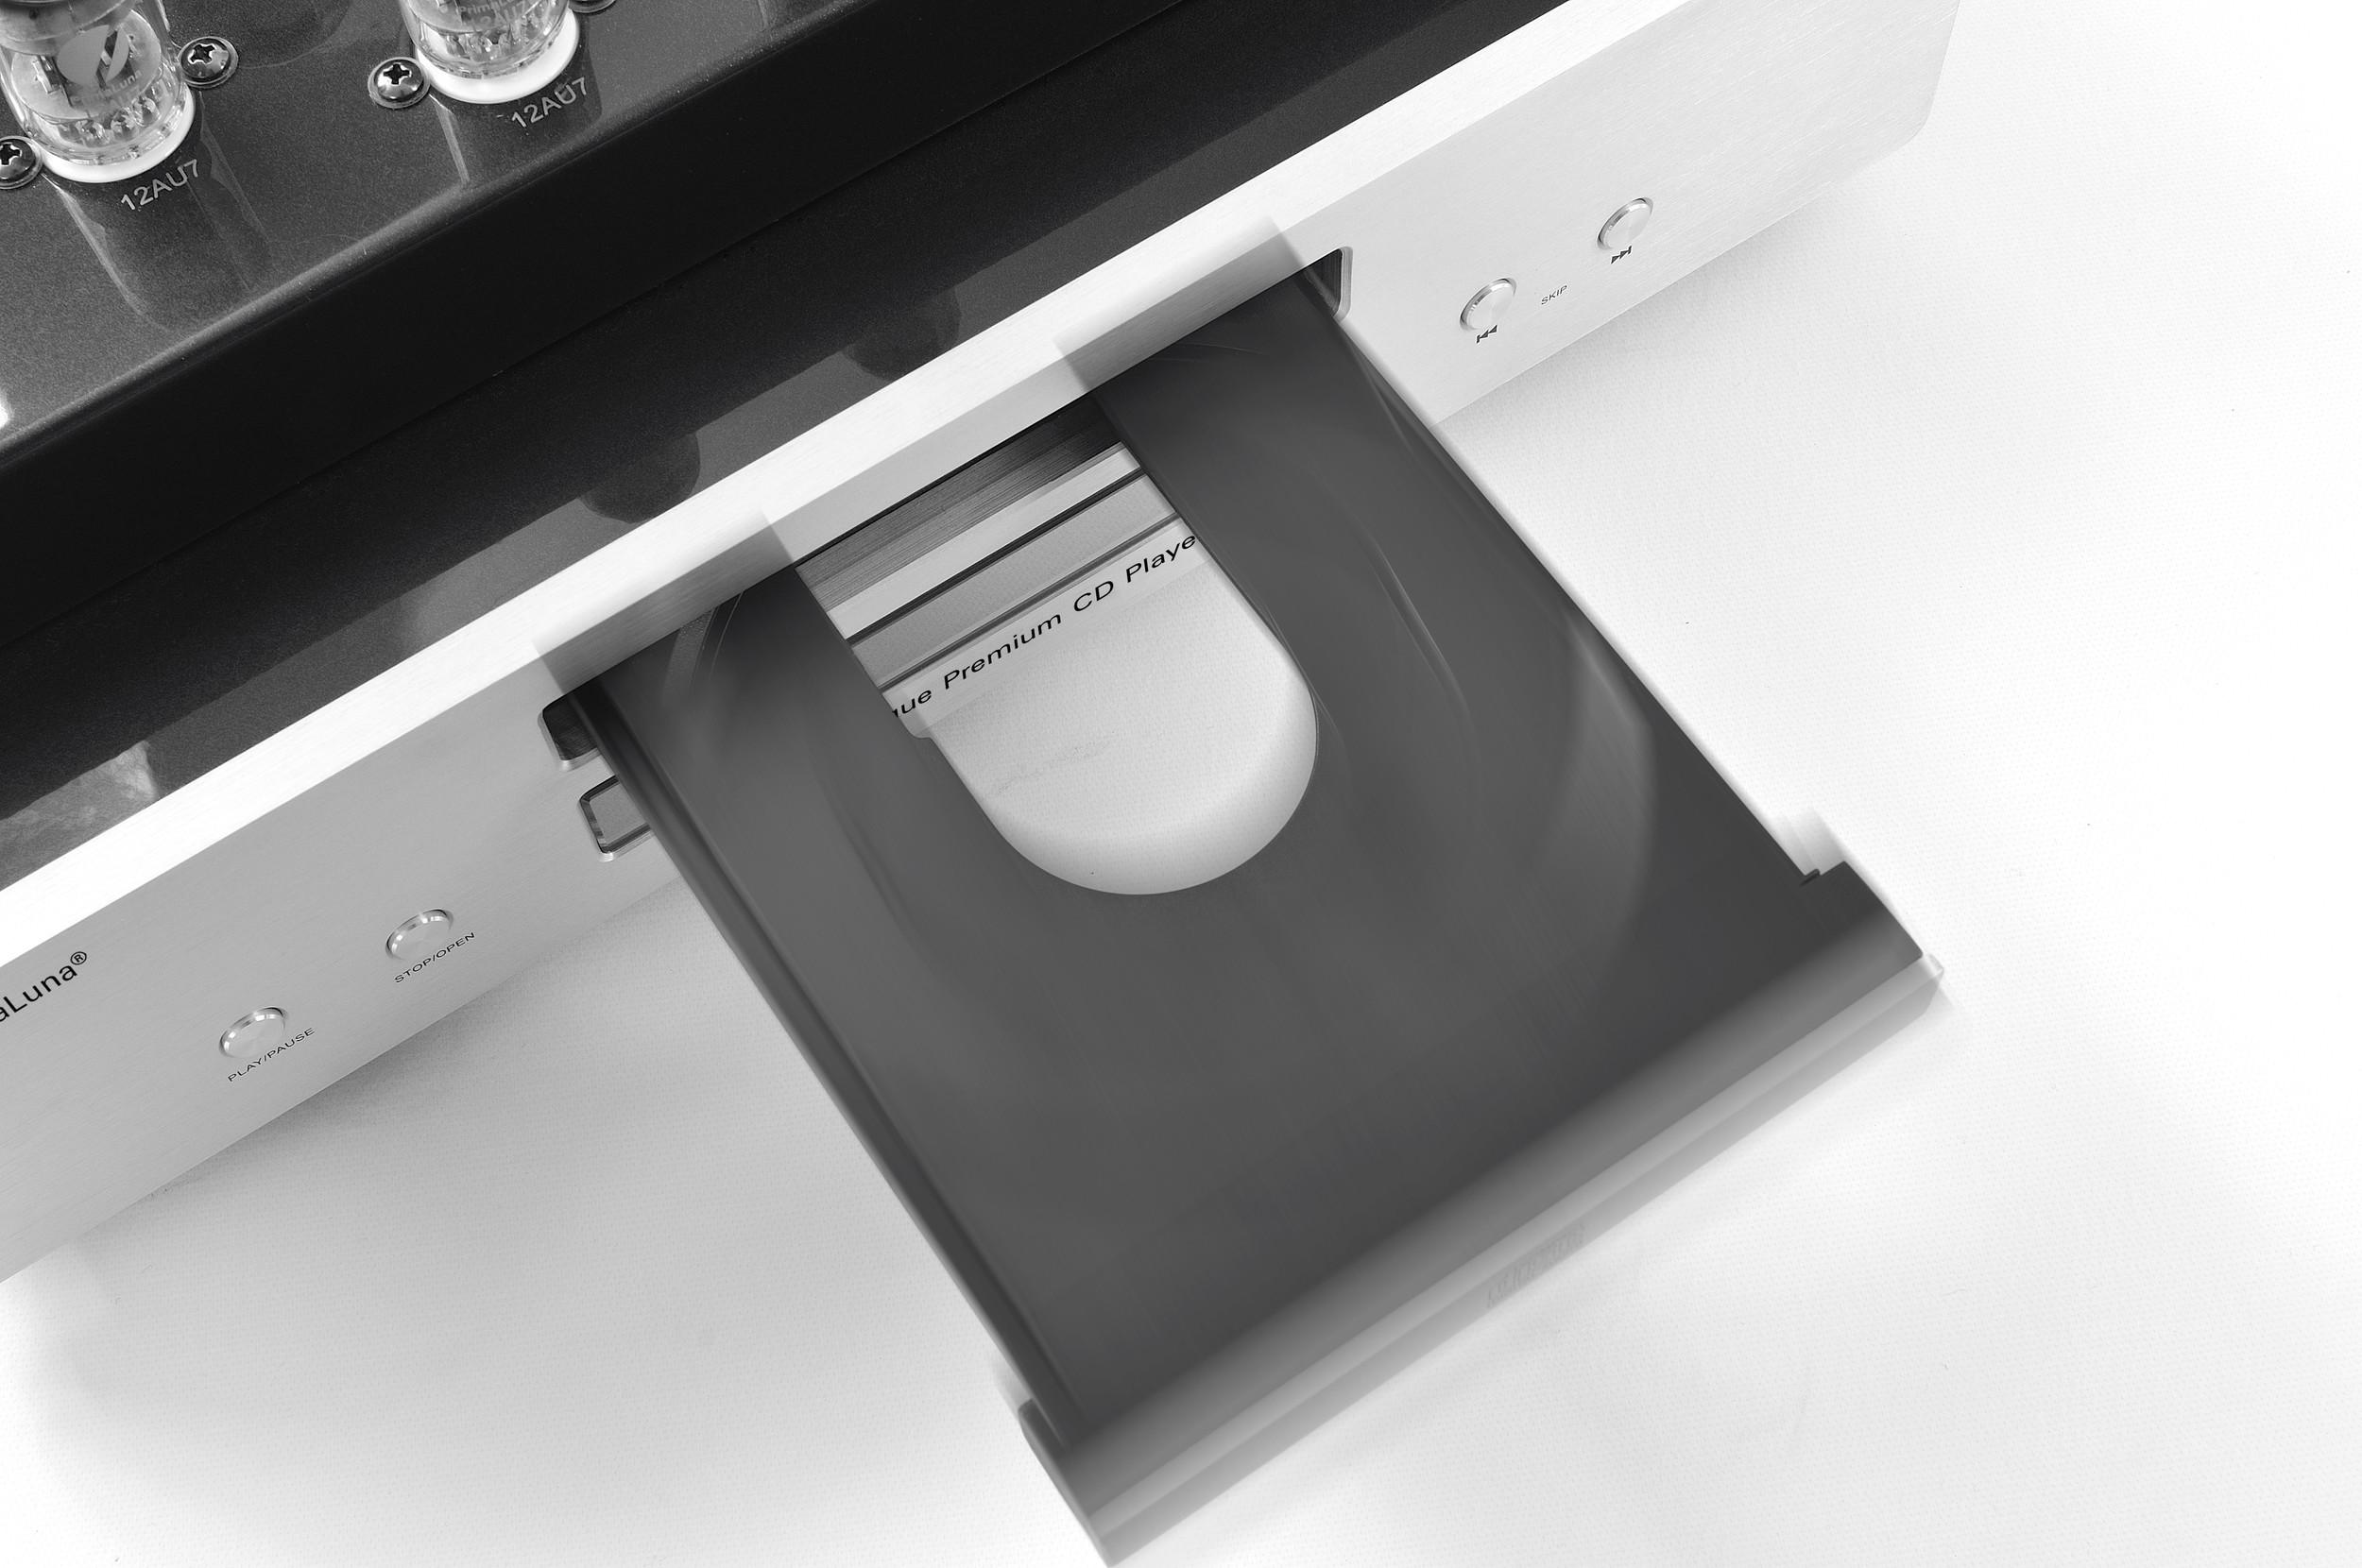 Prologue Premium CD Player - silver - special shot - HR - JPG.jpg